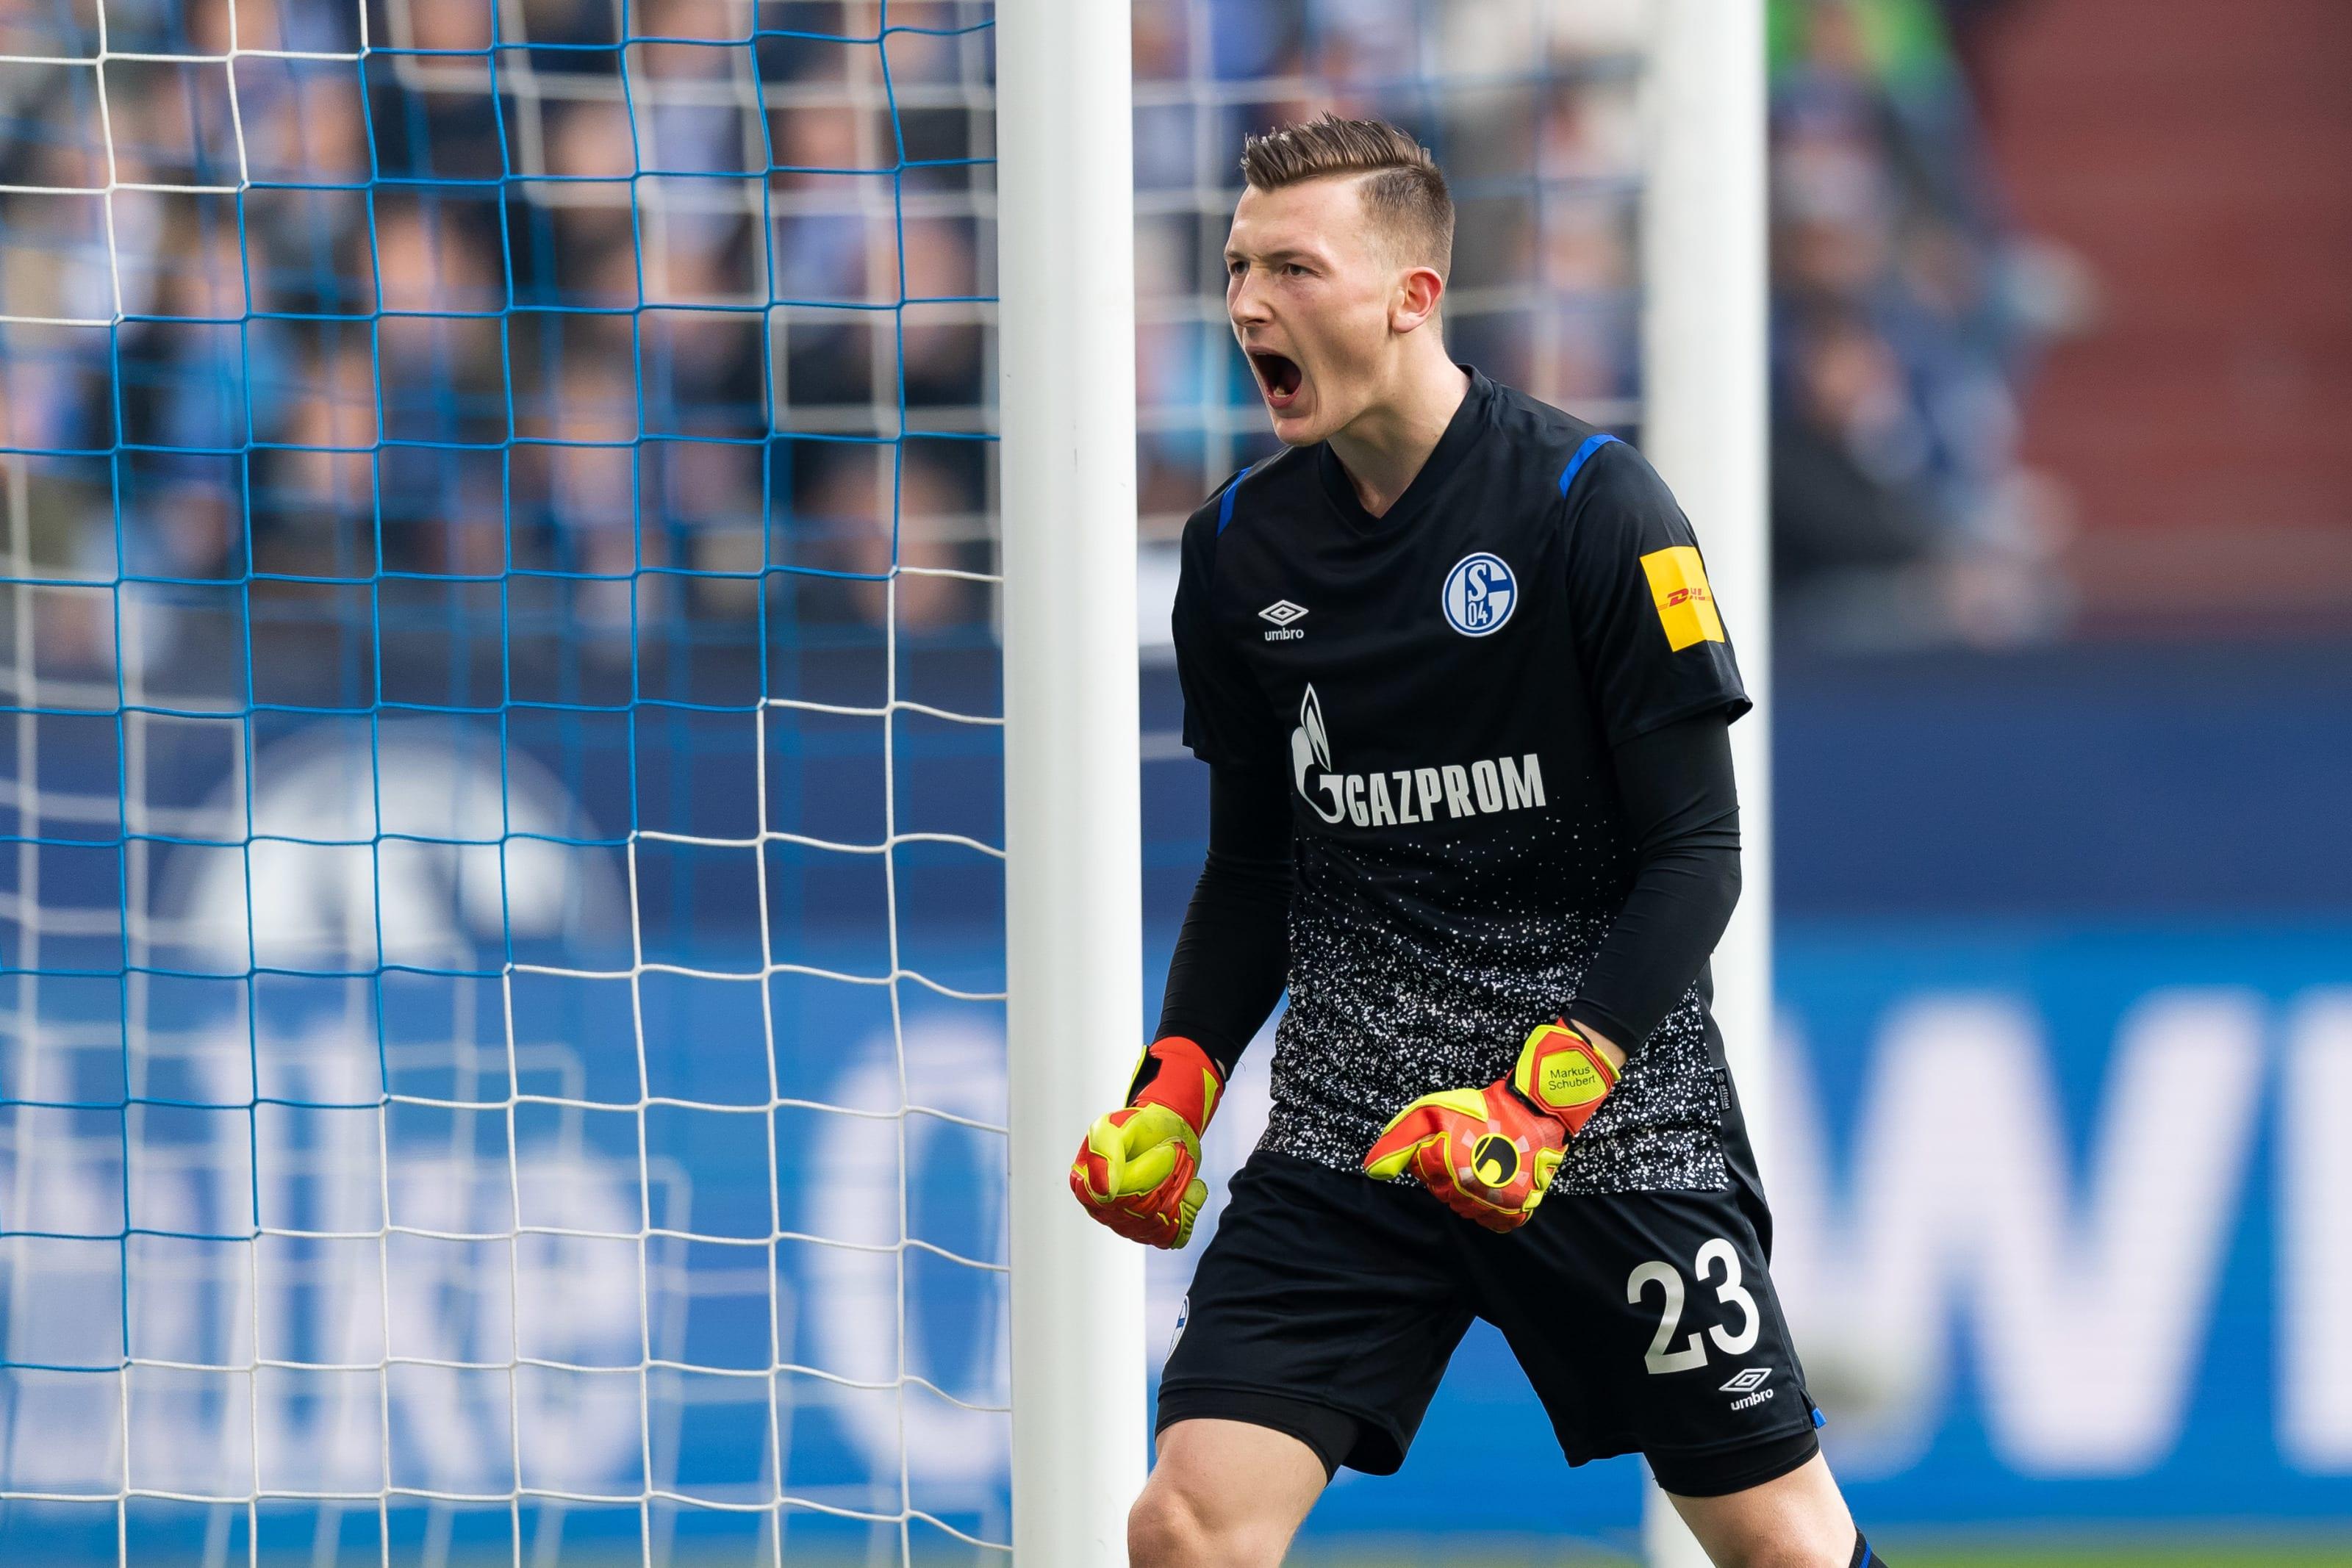 Schalke GK Markus Schubert